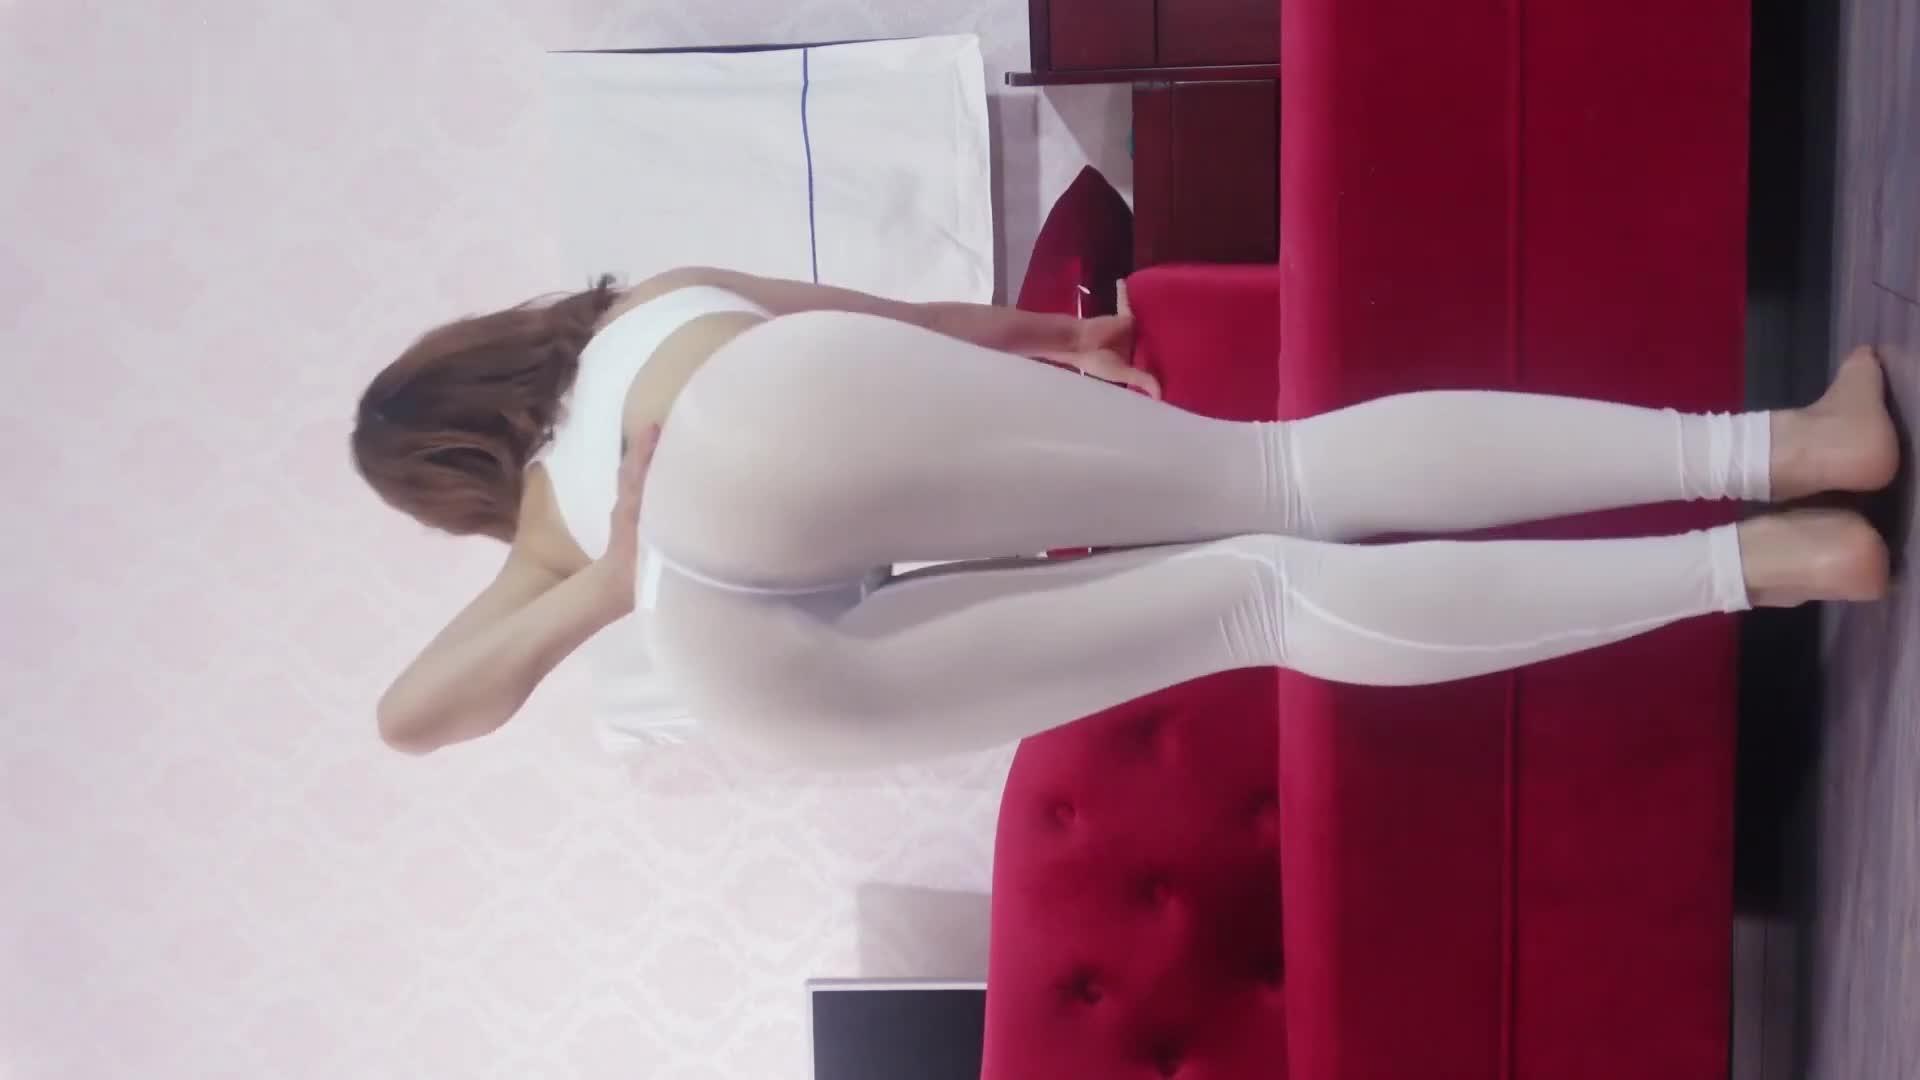 Sexy Dance 烈焰 透明緊身絲褲  動感沙發誘人美臀秀